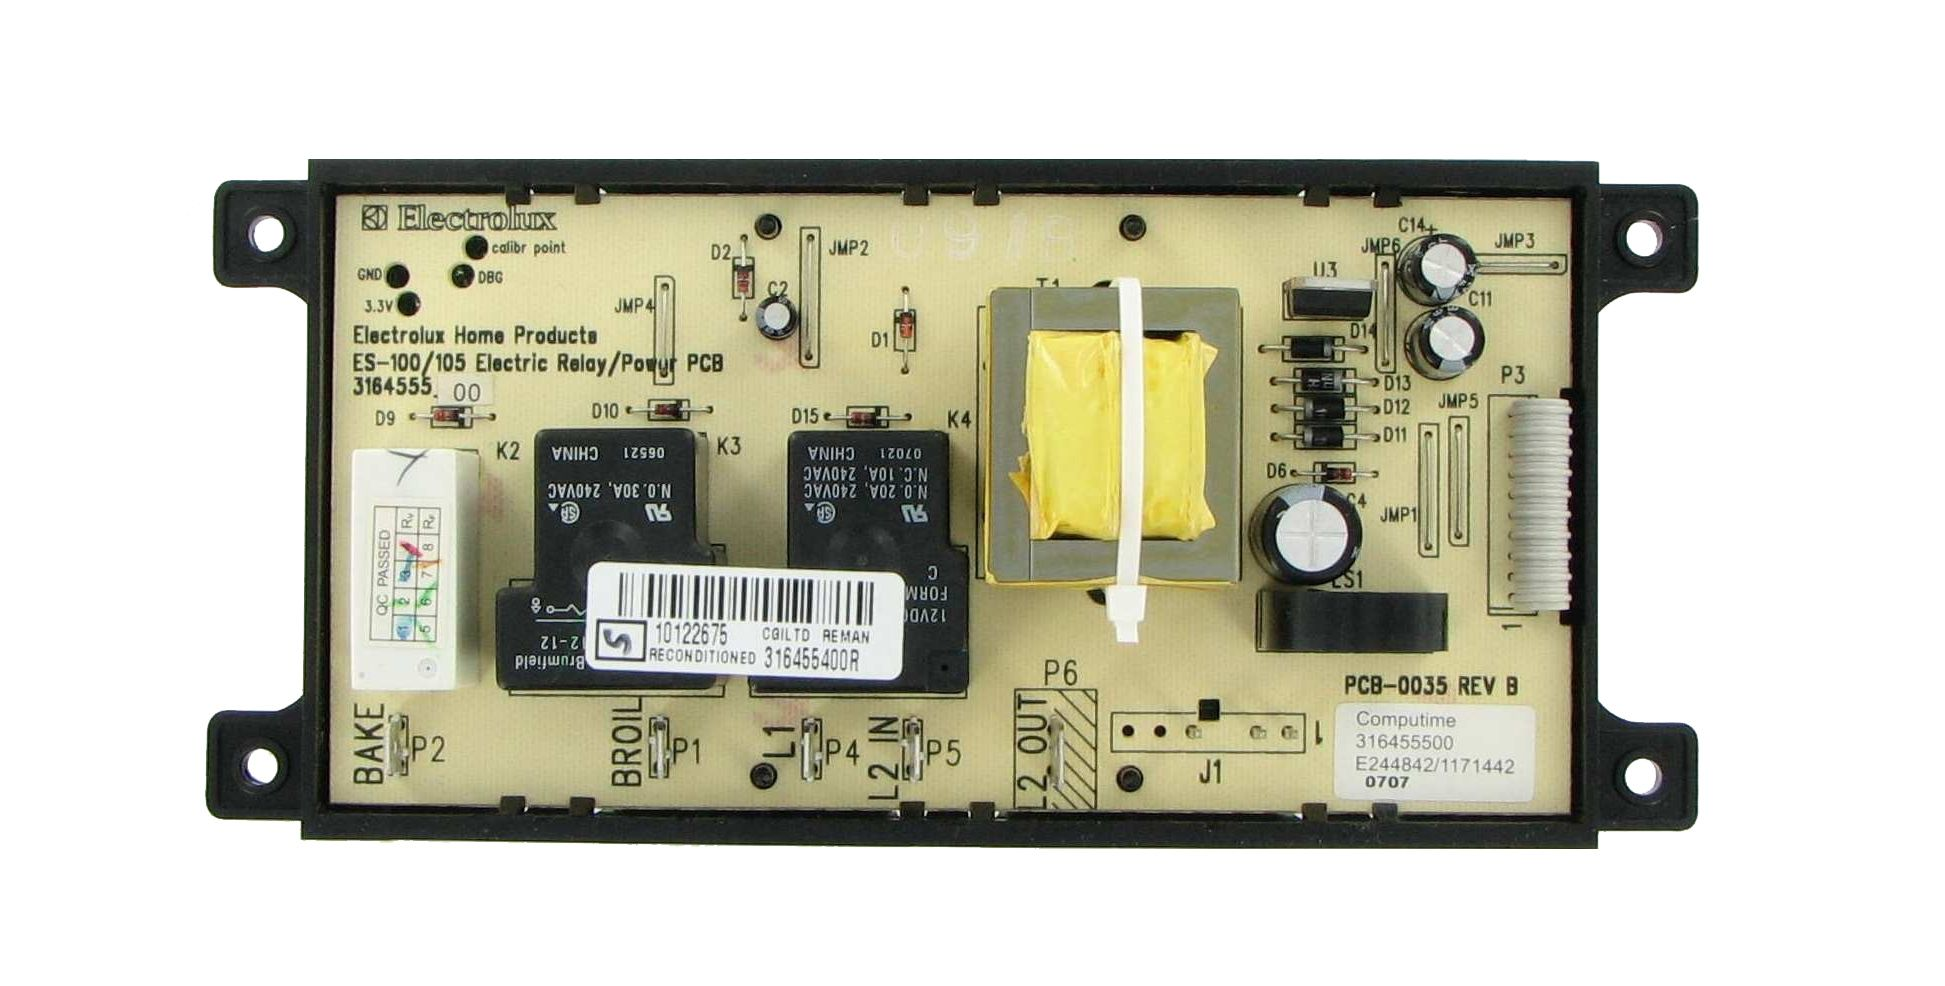 Frigidaire Crosley Gibson 316455400 Range Oven Control Board And Clock Kenmore Range Frigidaire Timer Clock